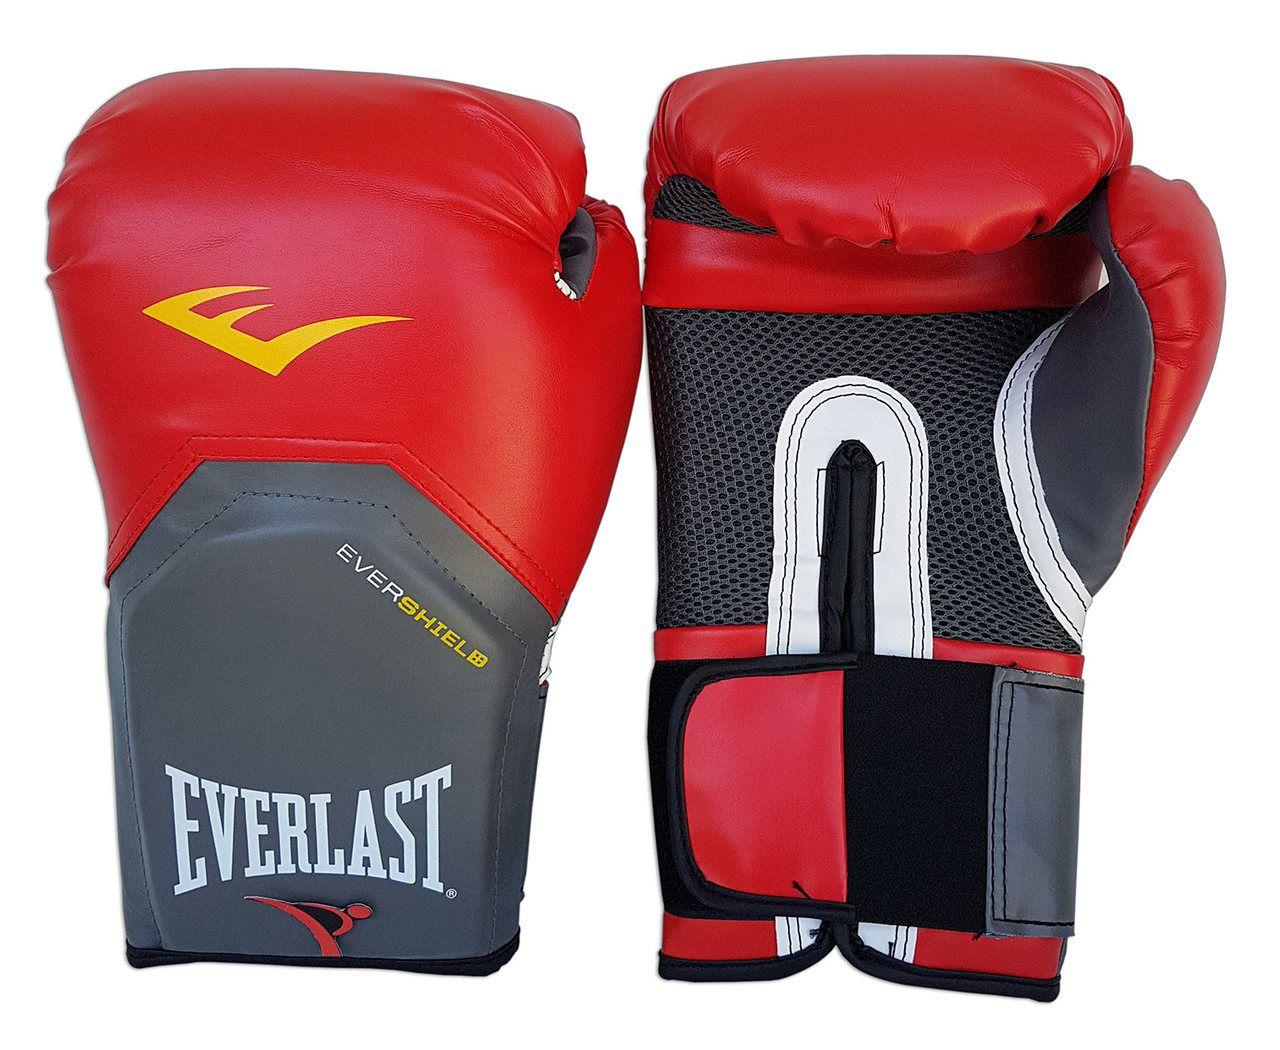 Luva de Boxe / Muay Thai 12oz - Vermelho - Pro Style - Everlast  - PRALUTA SHOP